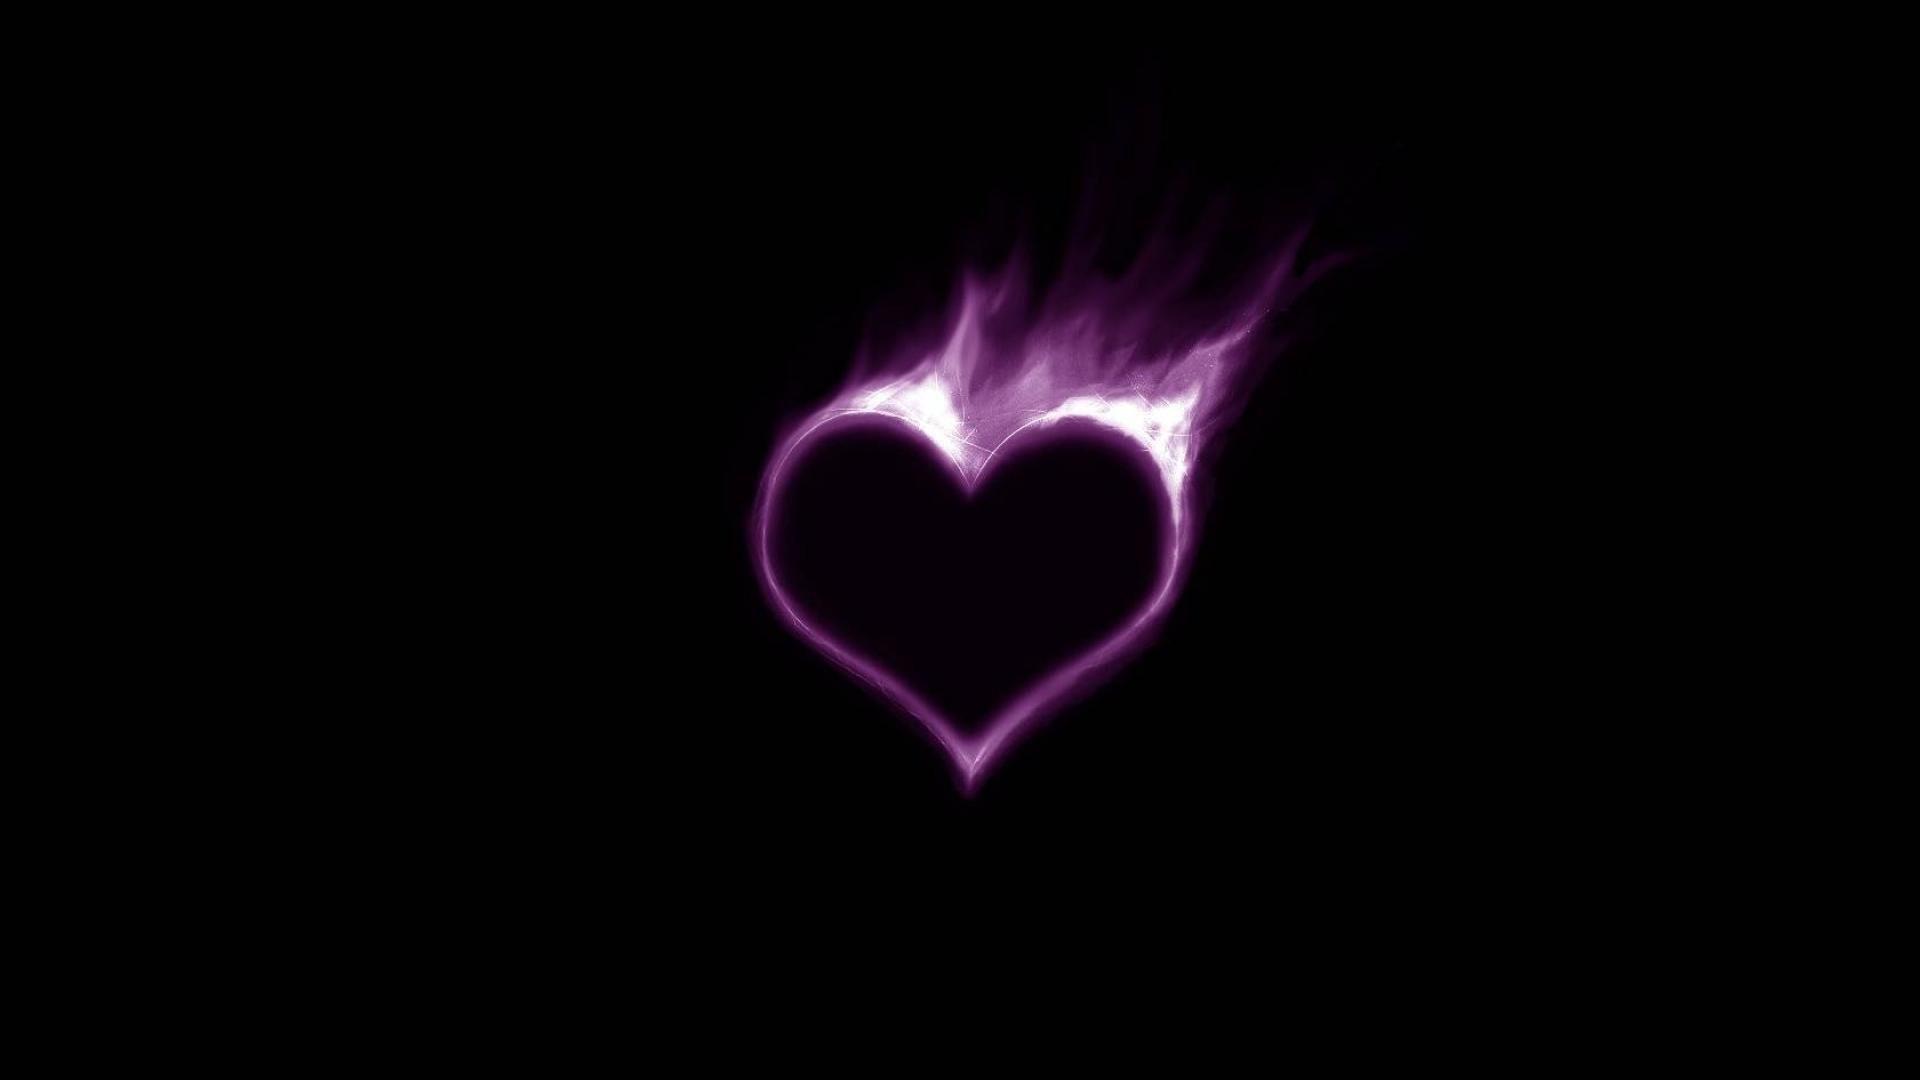 Purple And Black Hearts Wallpaper: Purple Heart Wallpaper (79+ Images